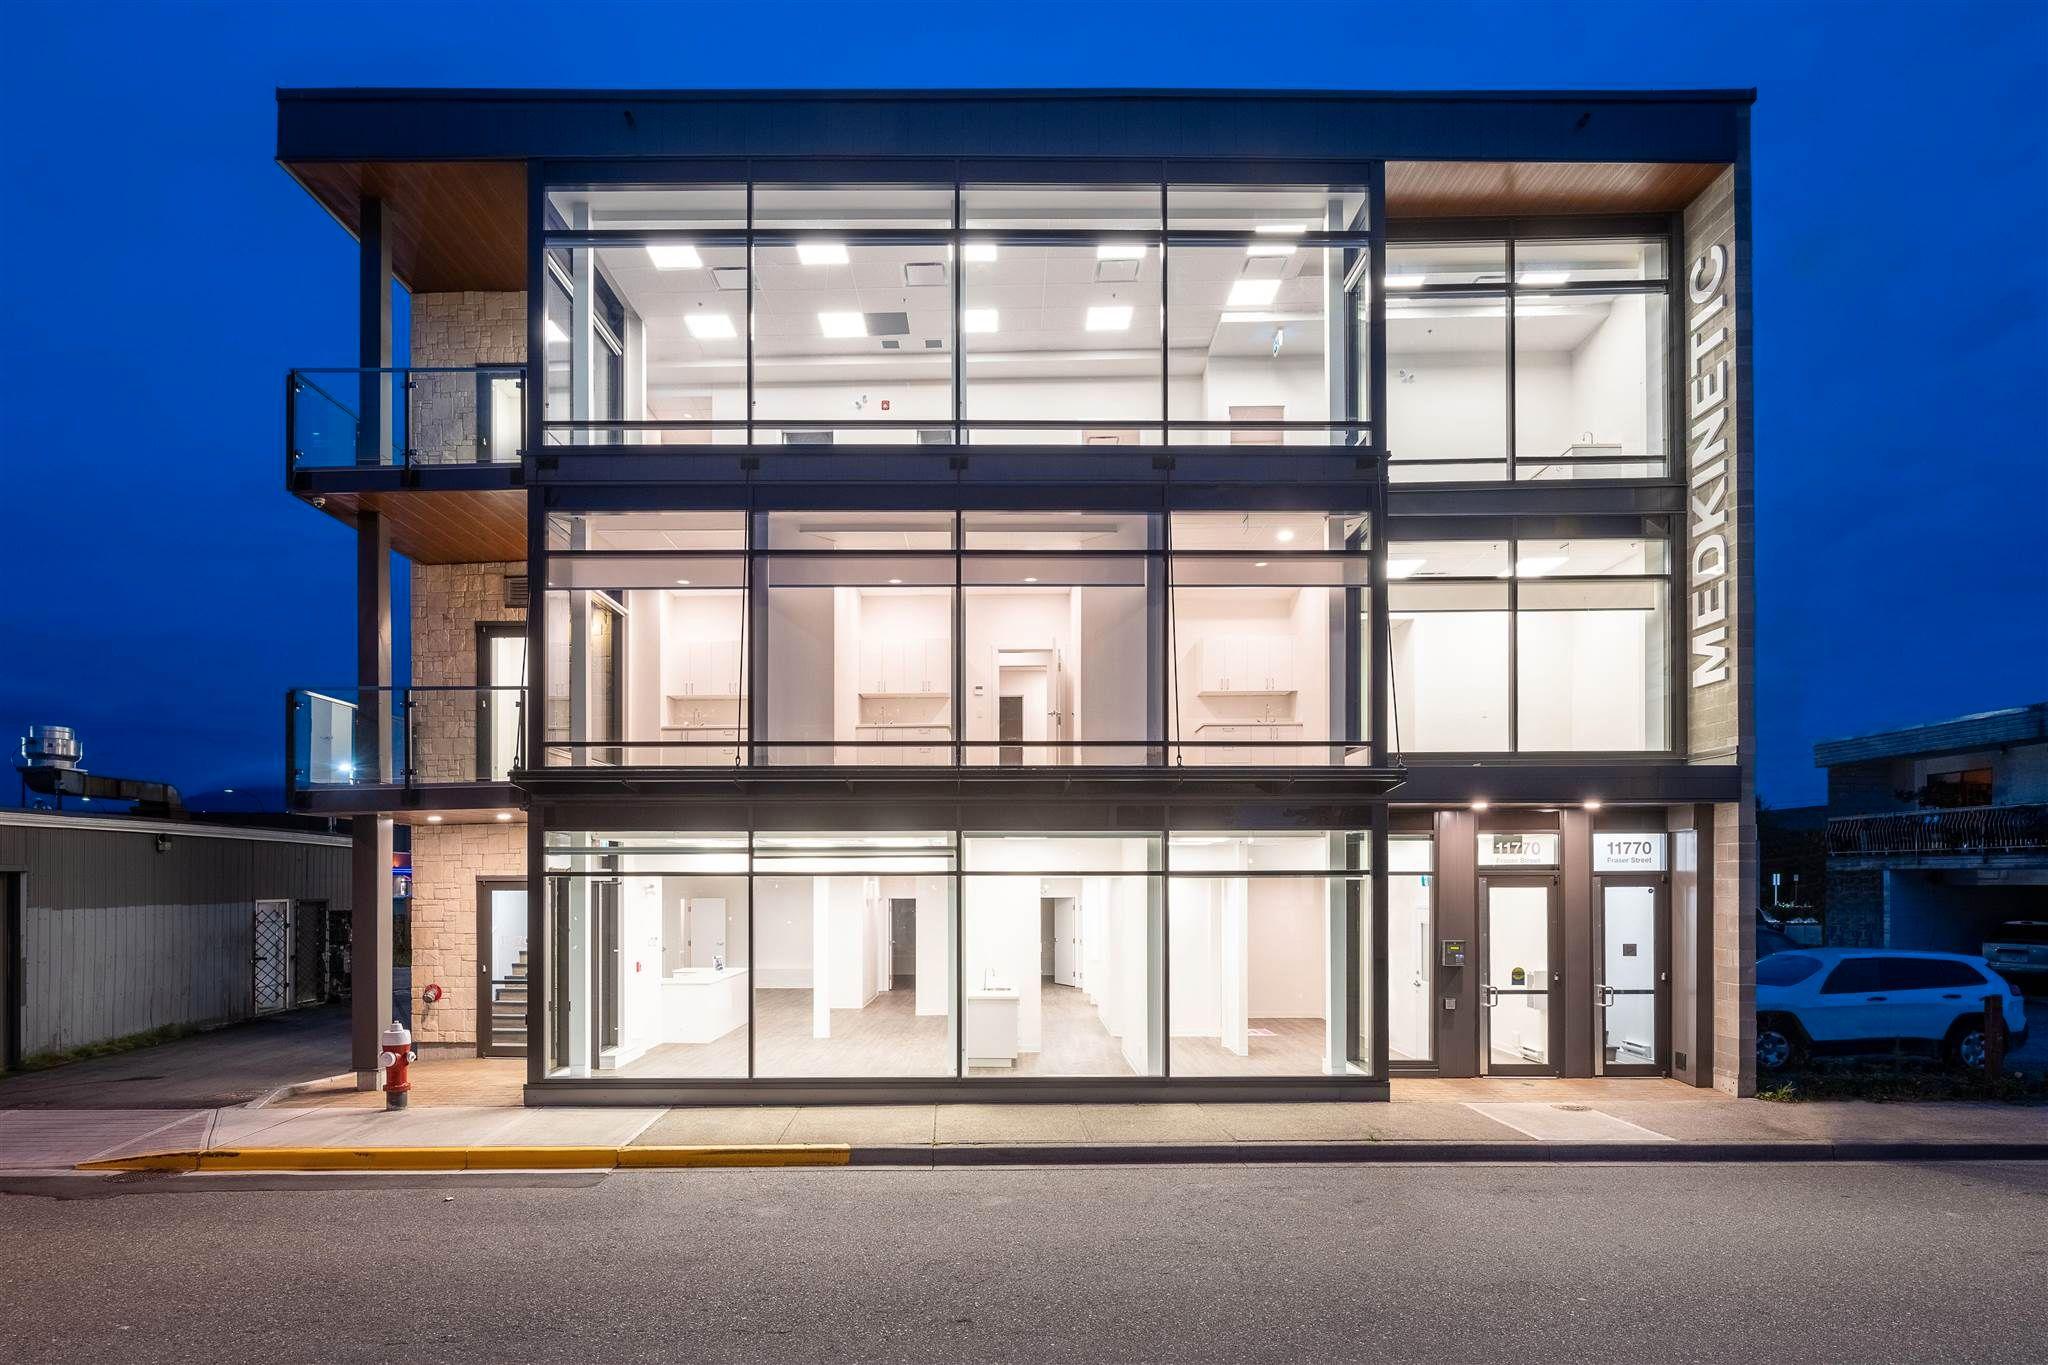 Main Photo: 304 11770 FRASER STREET in Maple Ridge: East Central Office for lease : MLS®# C8039572